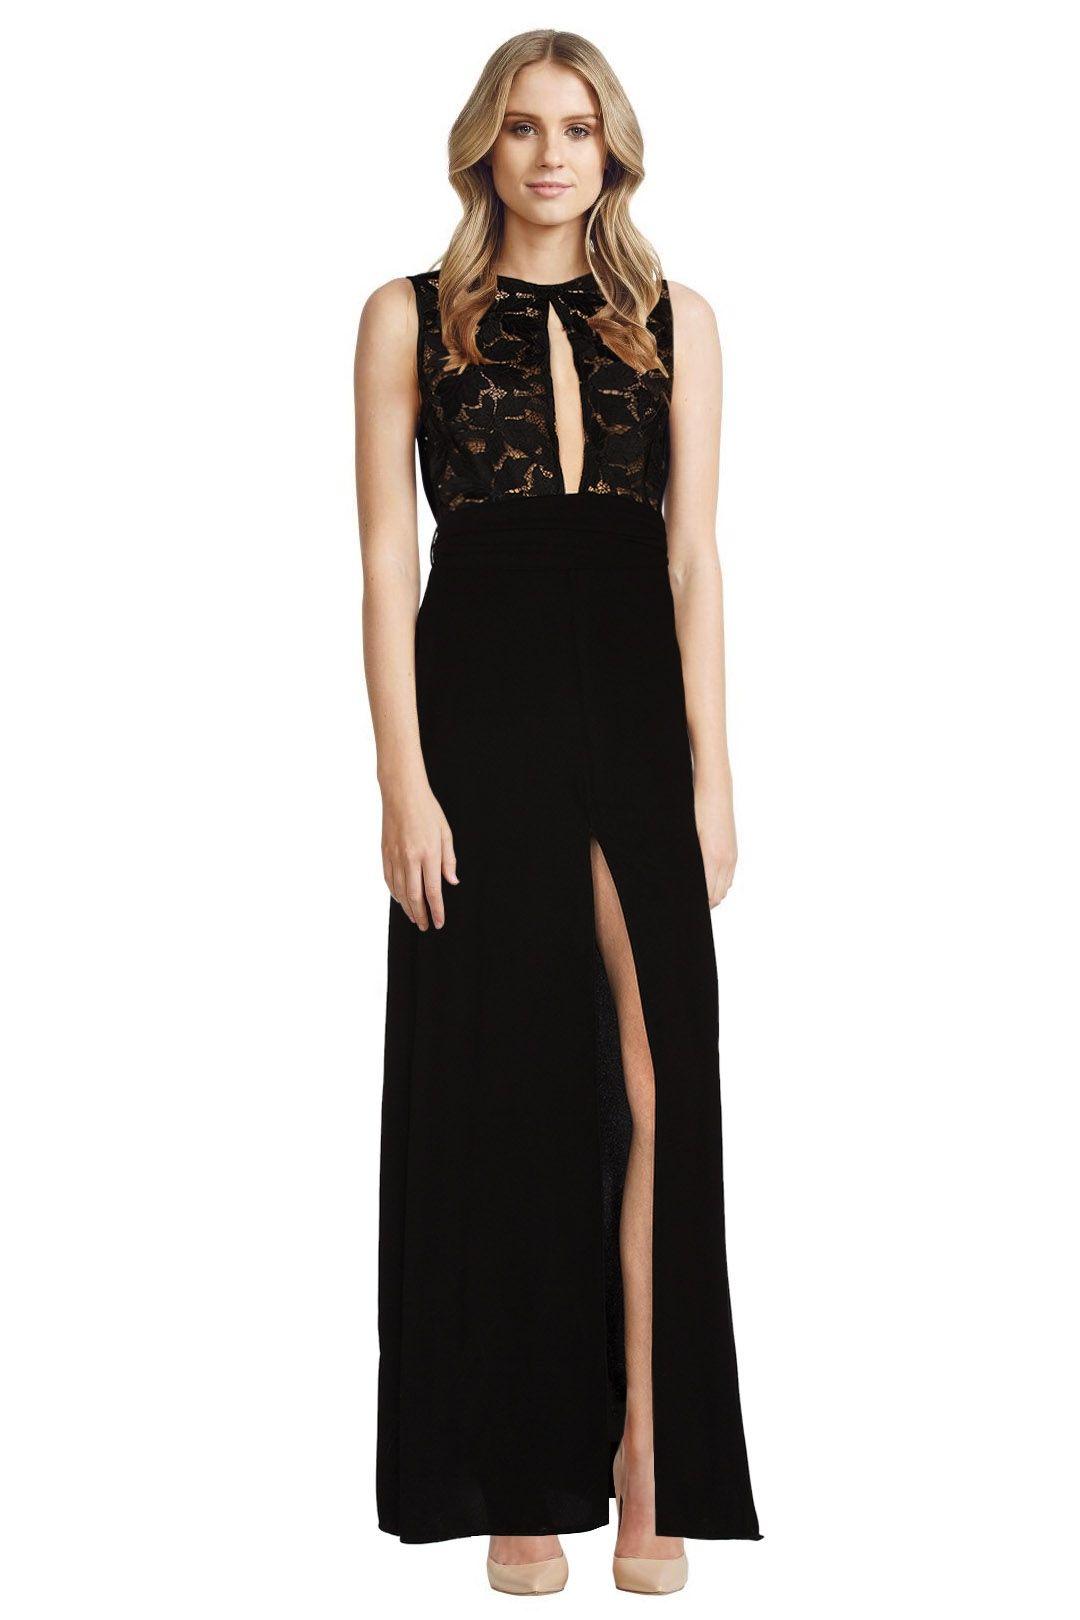 Assali - Poinsetia Dress - Black - Front